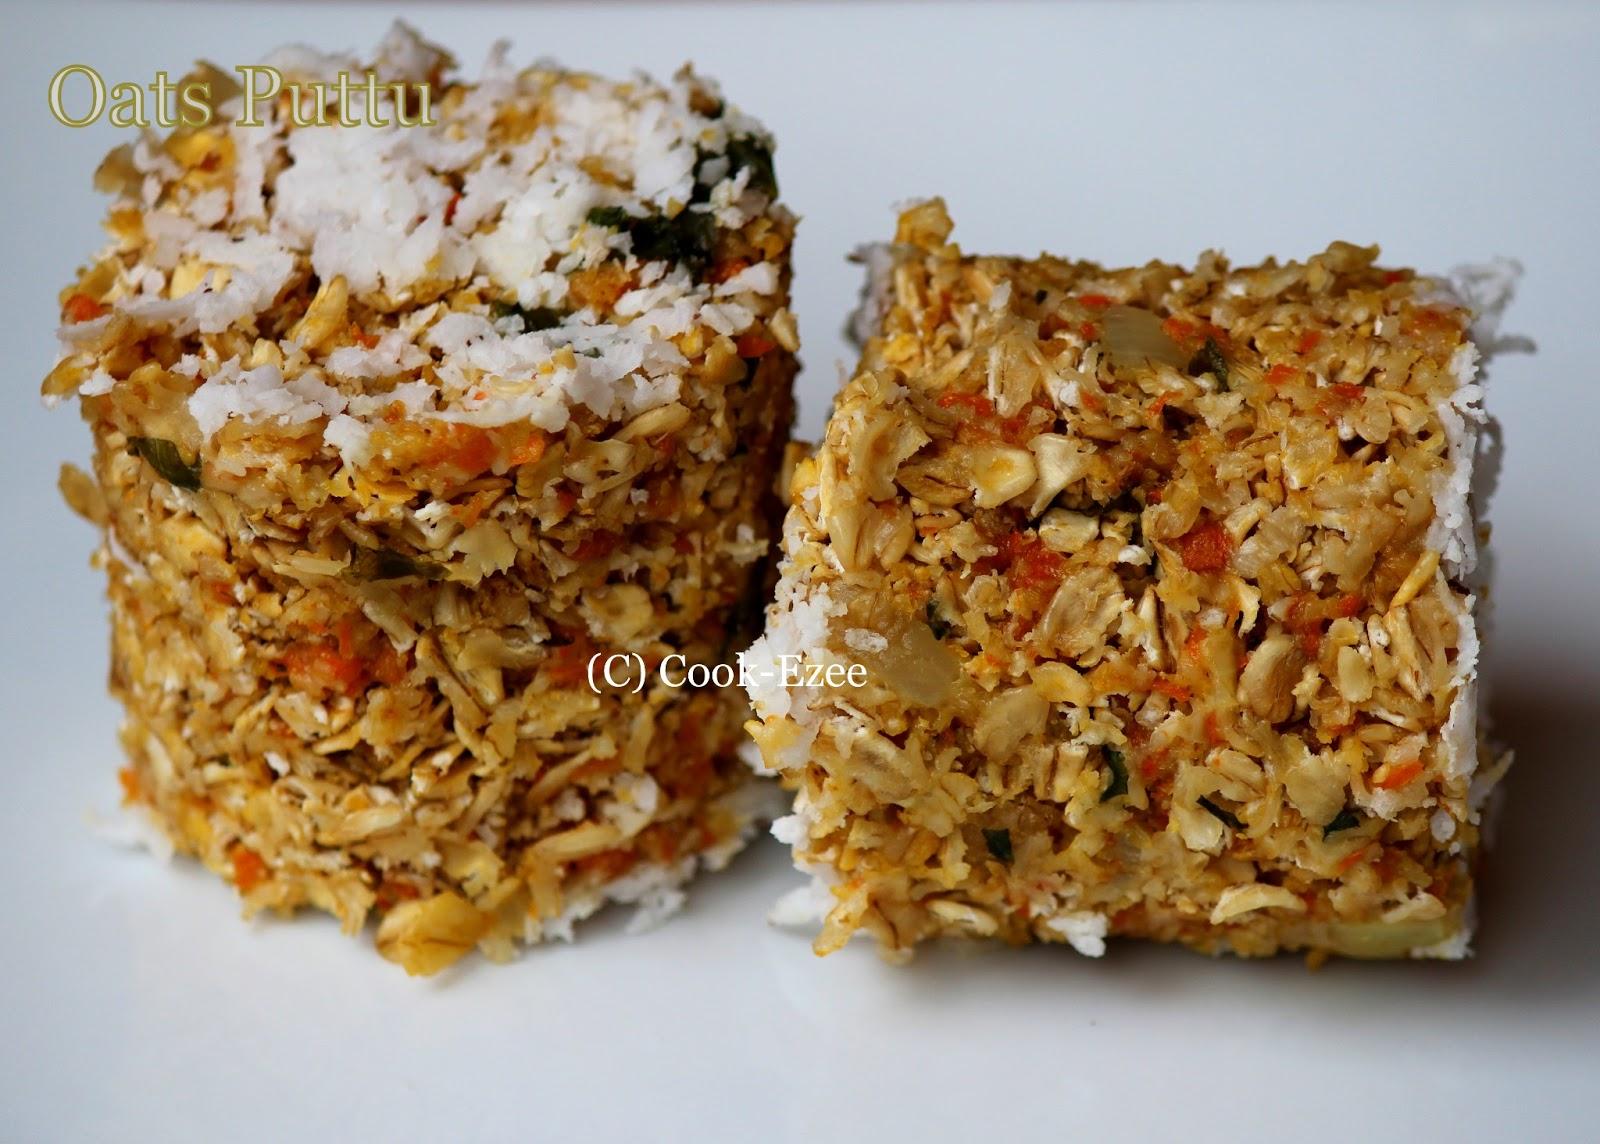 Kerala breakfast recipes vegetarian food waste kerala breakfast recipes vegetarian forumfinder Choice Image